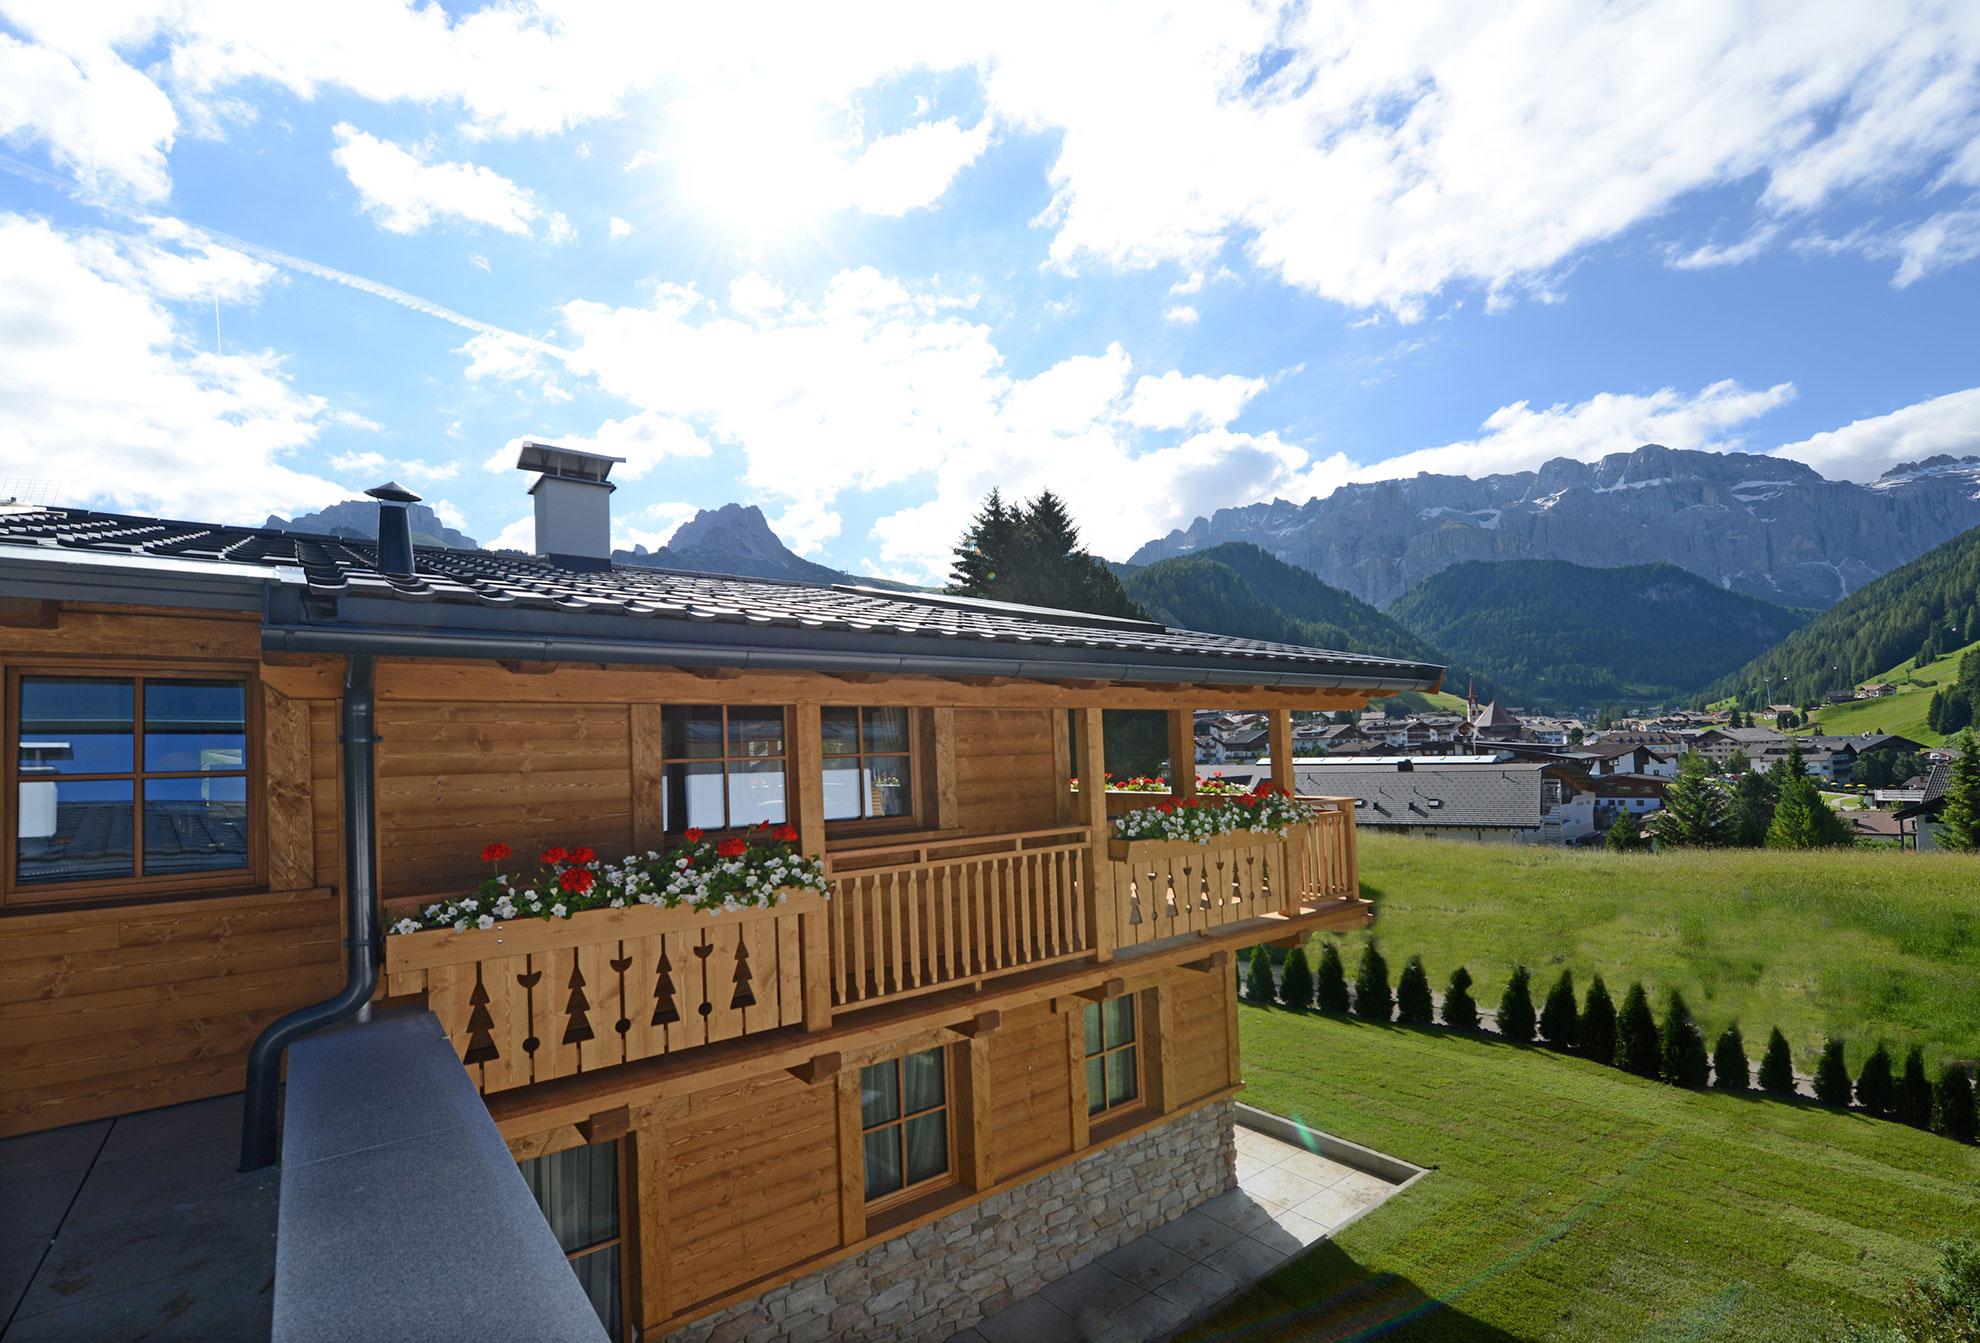 Pine Lodge Dolomites Luxury Chalet Dolomite Mountains